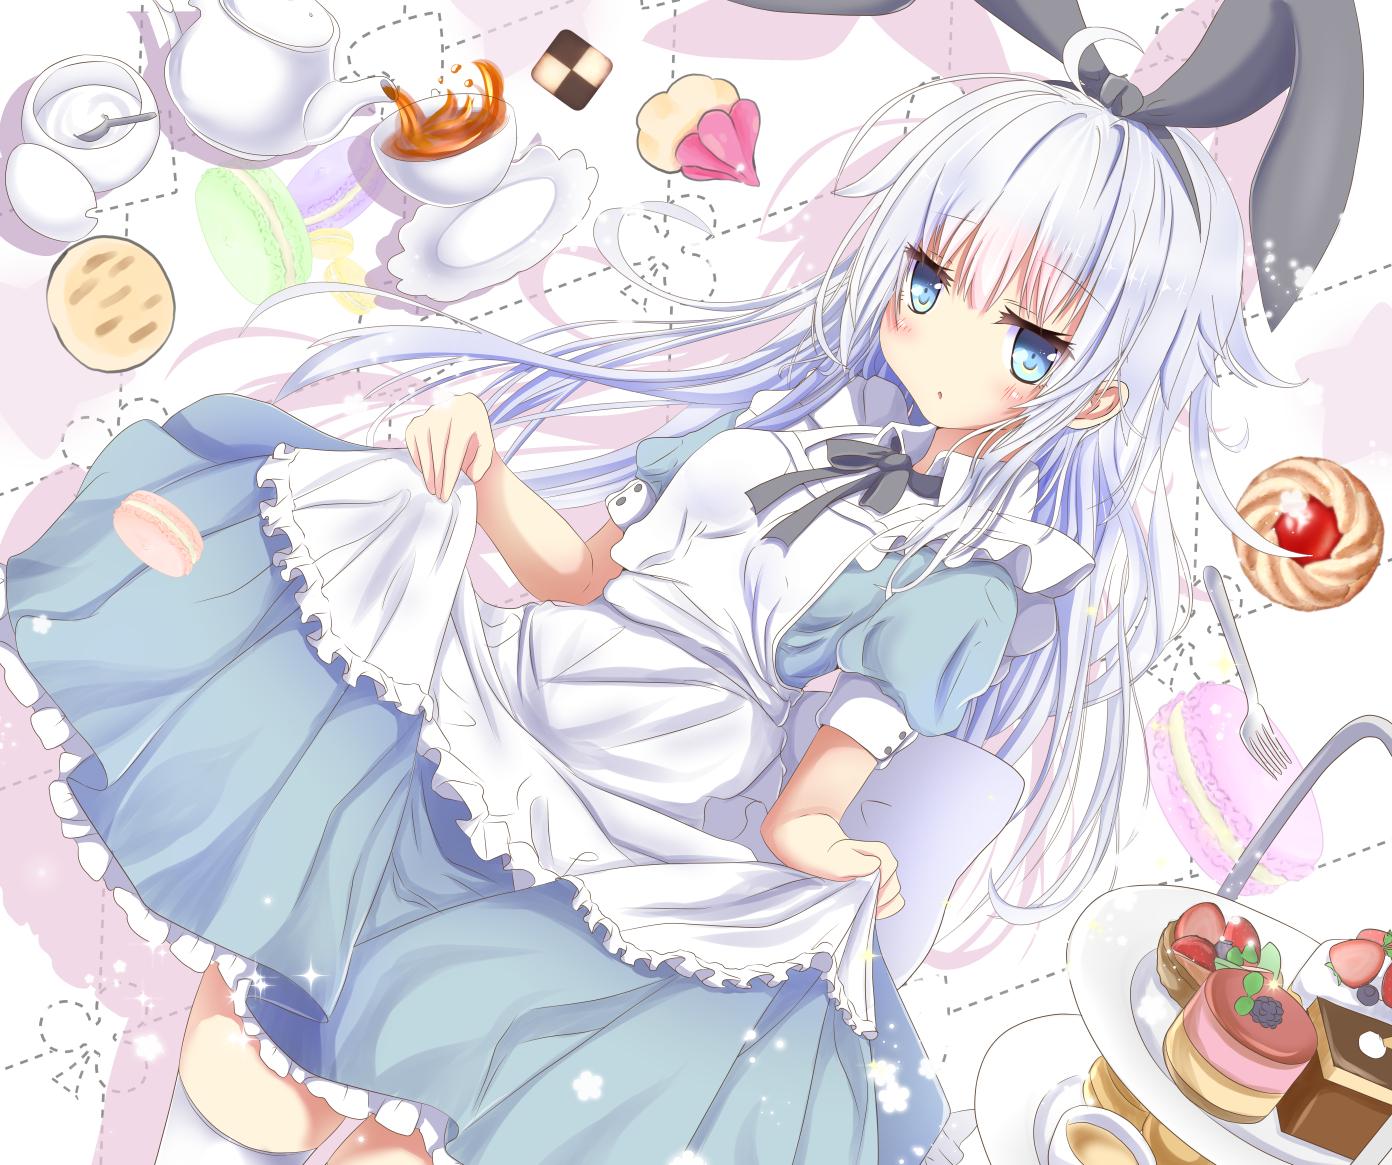 Image Dress Up Sakura Edited 1 Jpg: Aliasing Alice In Wonderland Anthropomorphism Apron Aqua